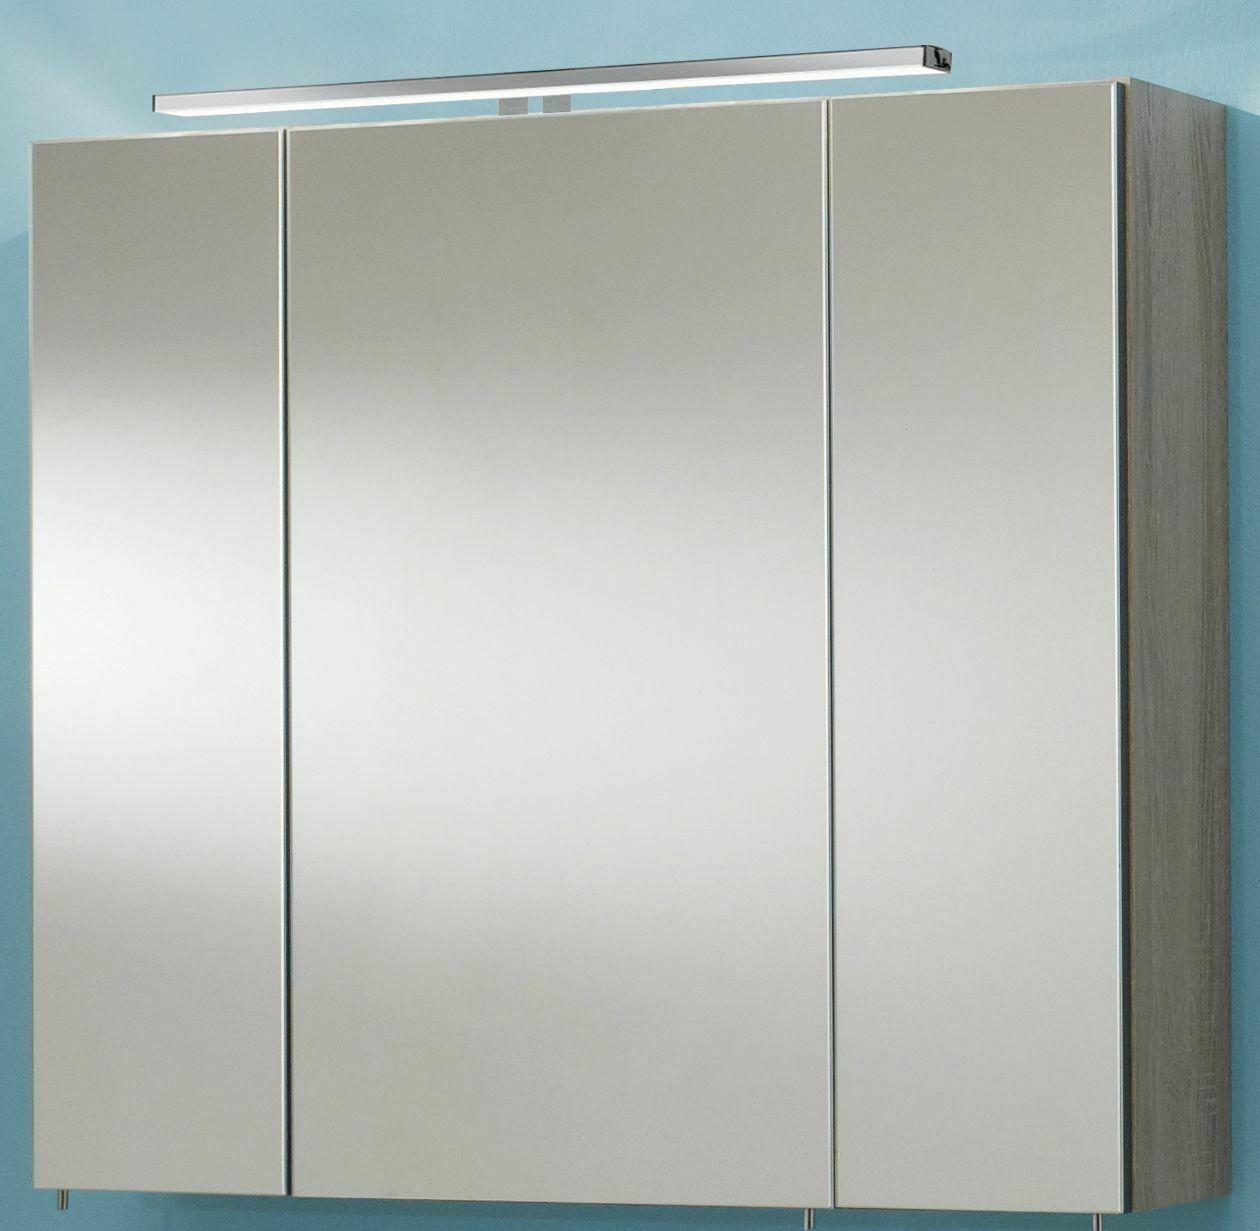 badmobel set 3 teile waschplatz 80 cm led spiegelschrank badezimmer ram 80 holz